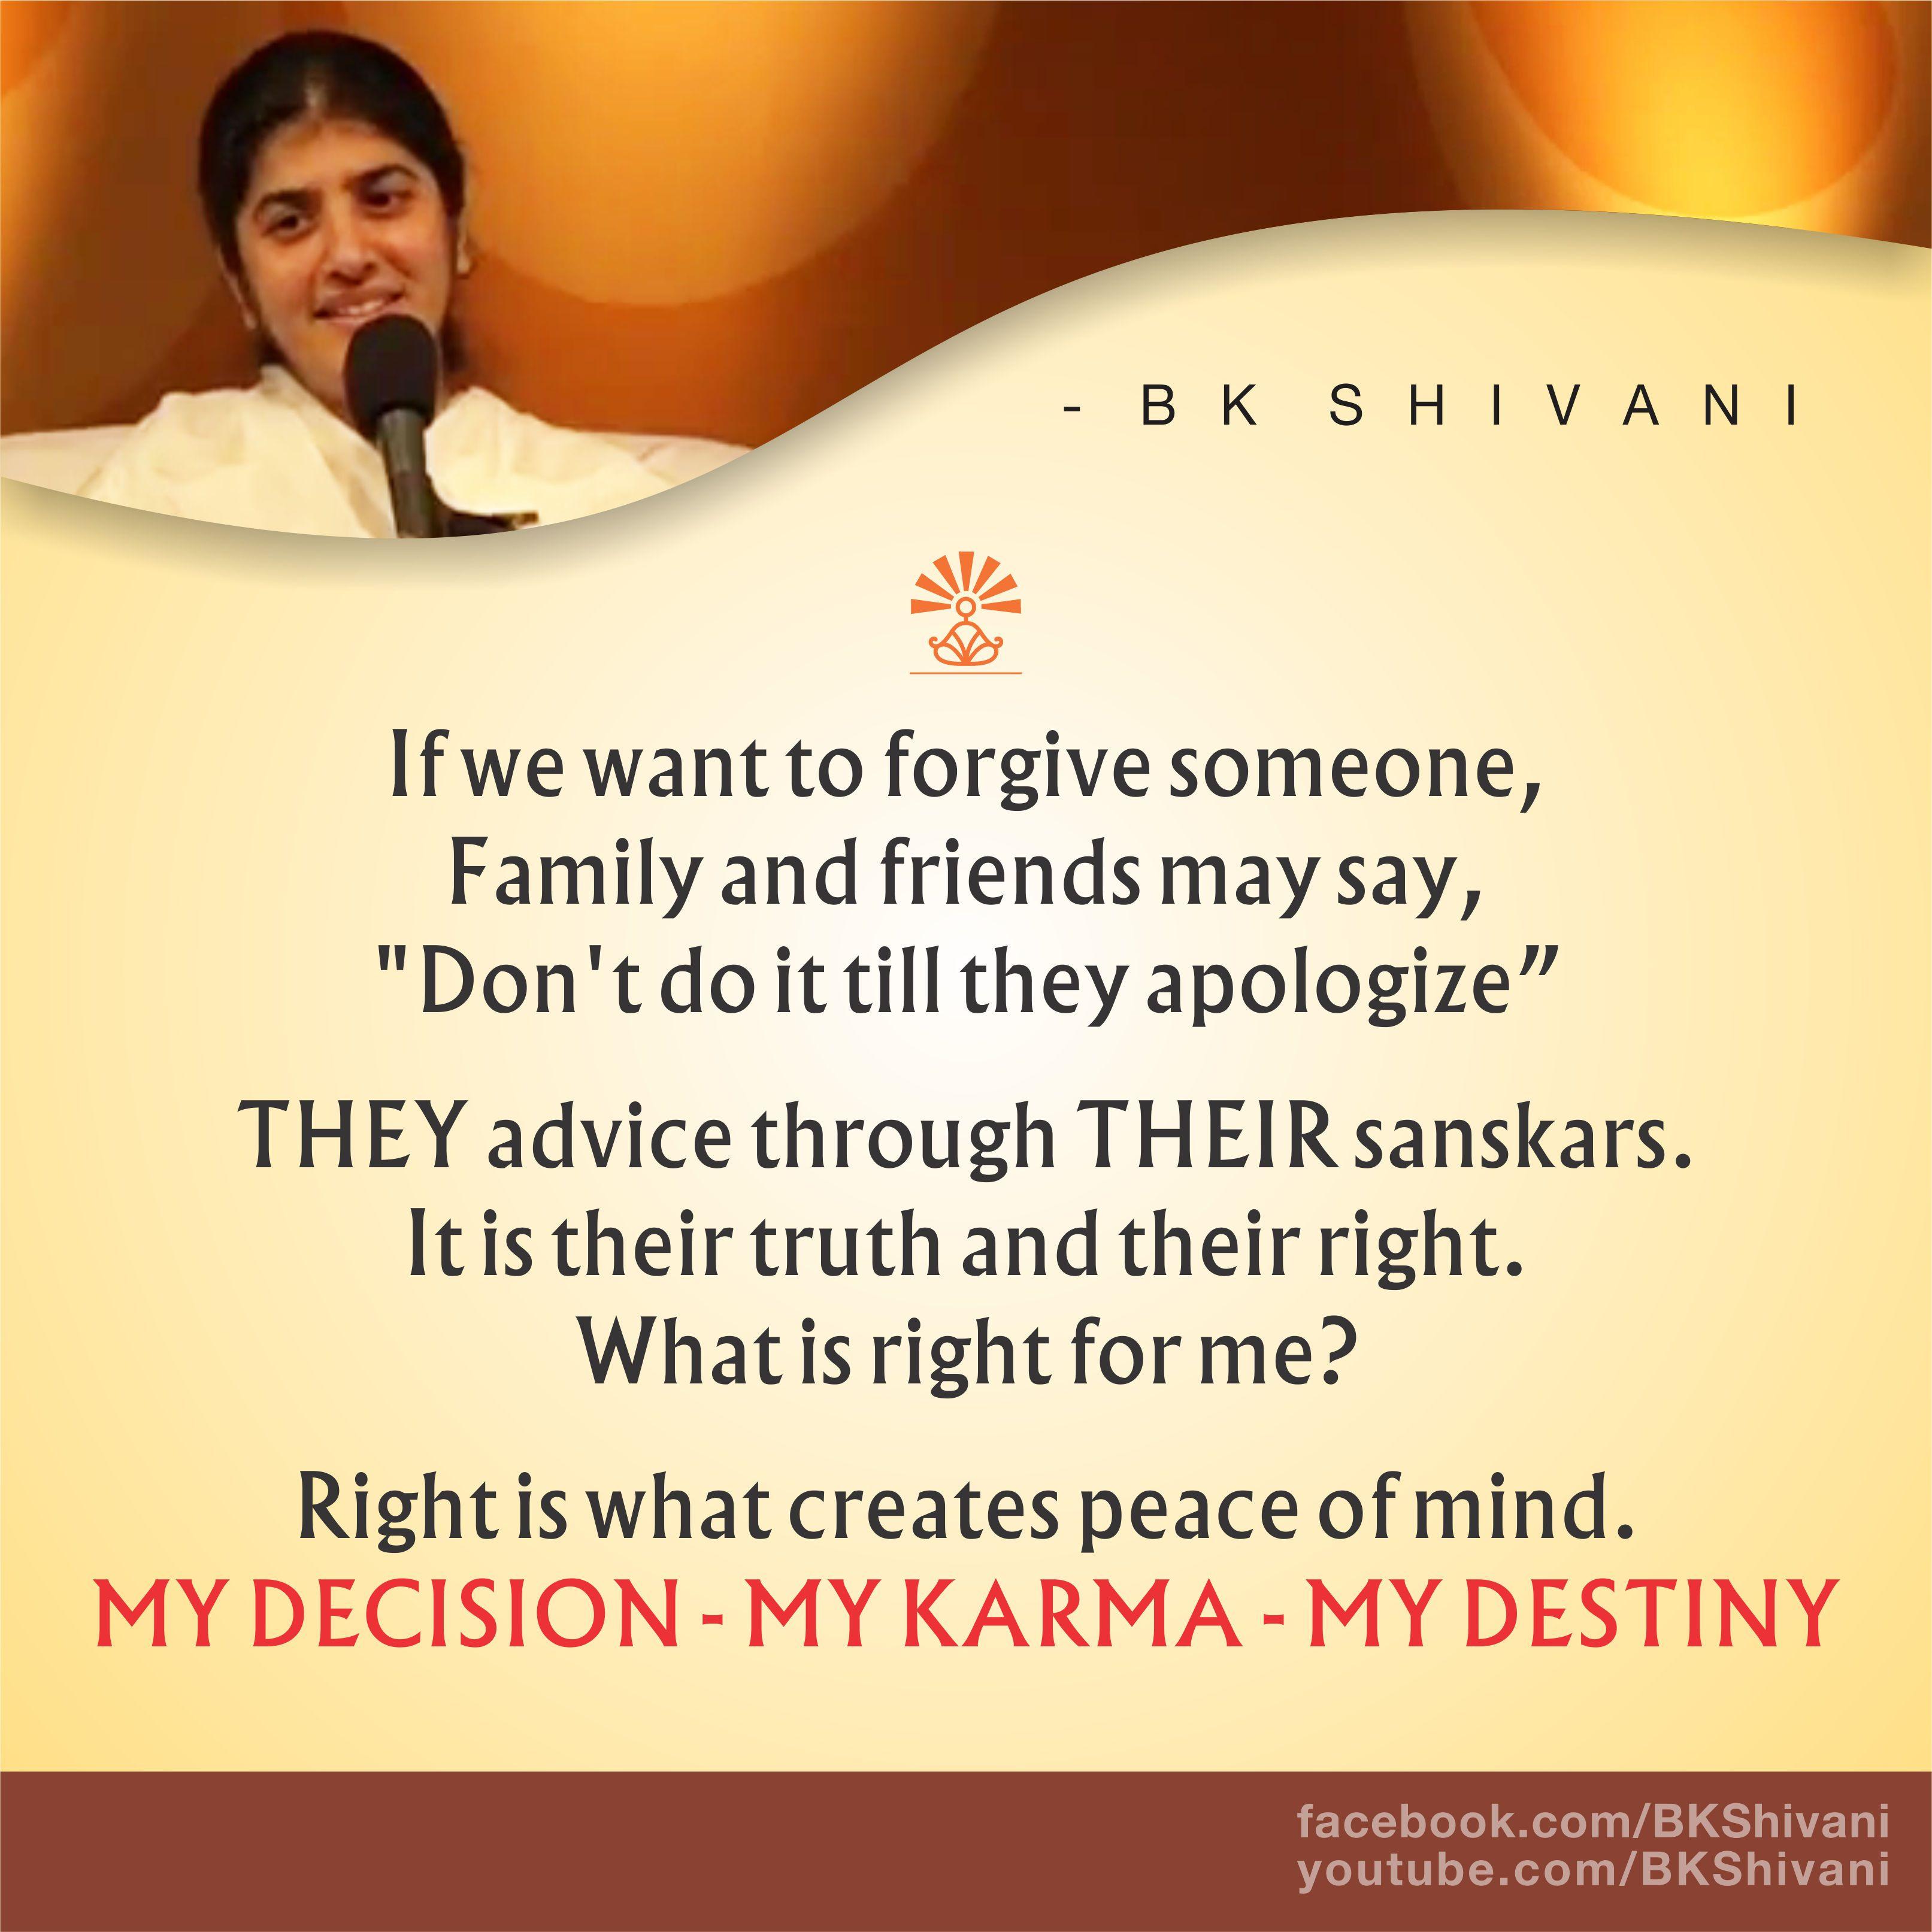 Brahma Kumaris Positive Thinking Quotes: Pin By Madhavi Gajria On BK Shivani T Quotes Brahma